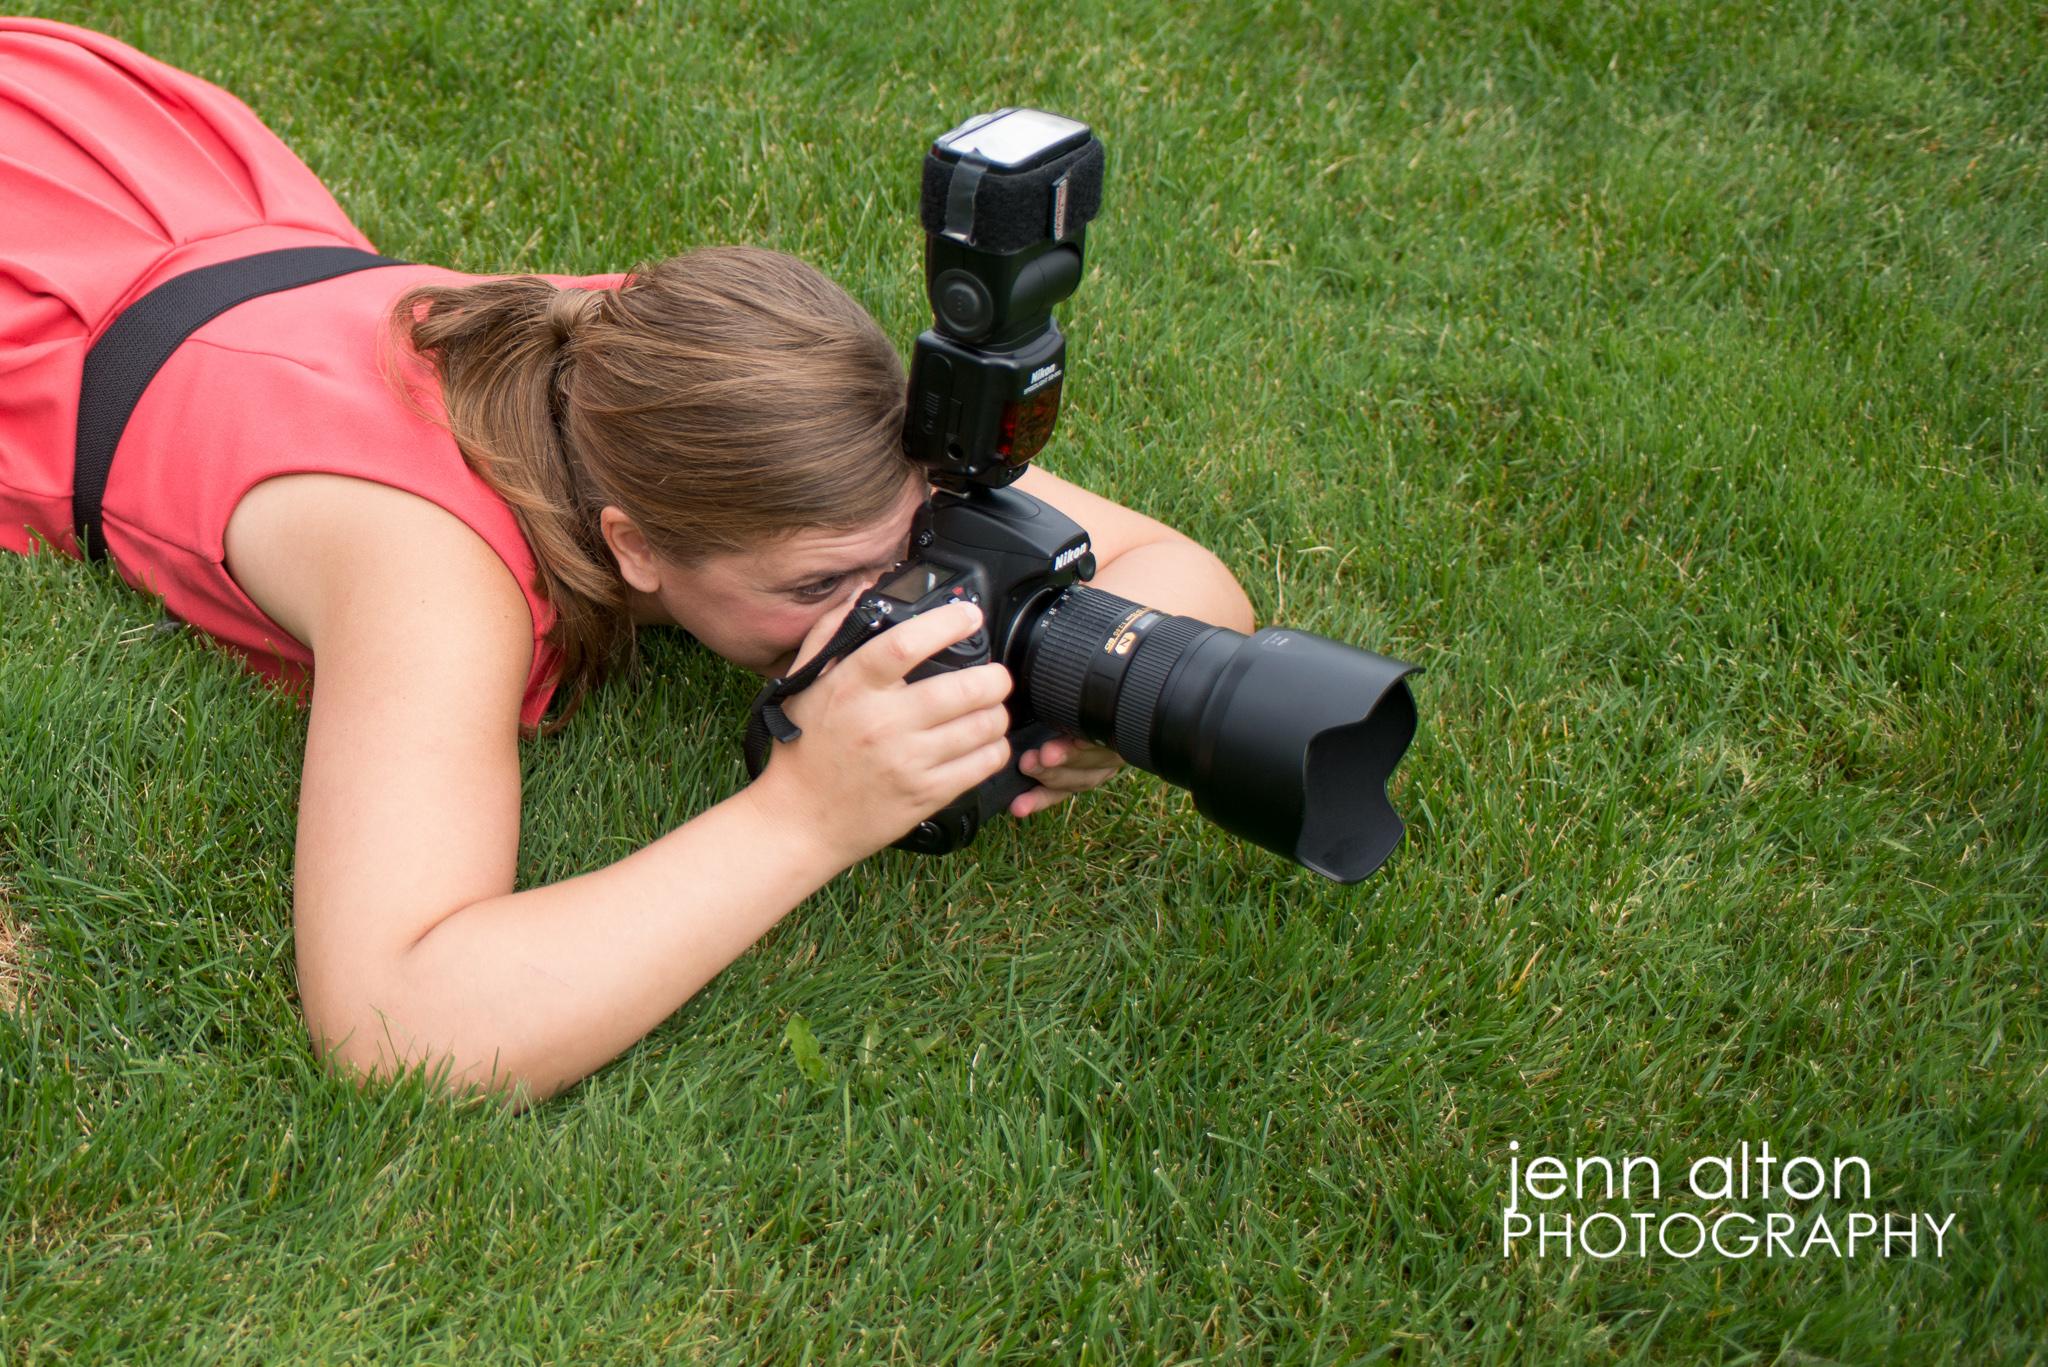 Photographer on the ground for photos